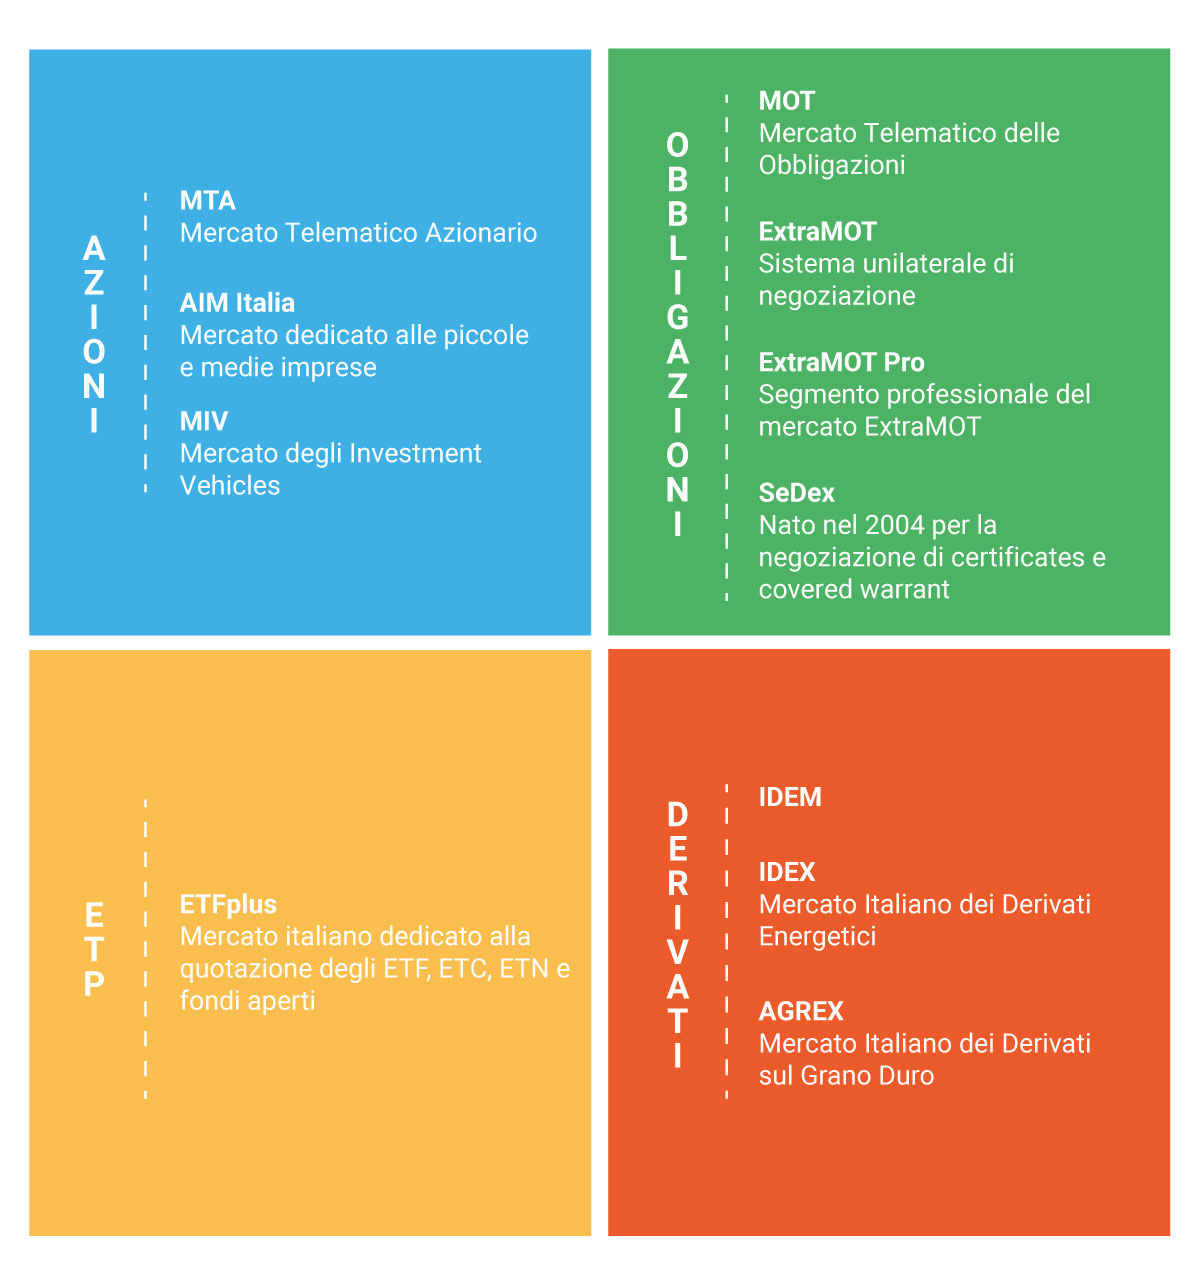 I mercati finanziari presenti in Borsa Italiana.